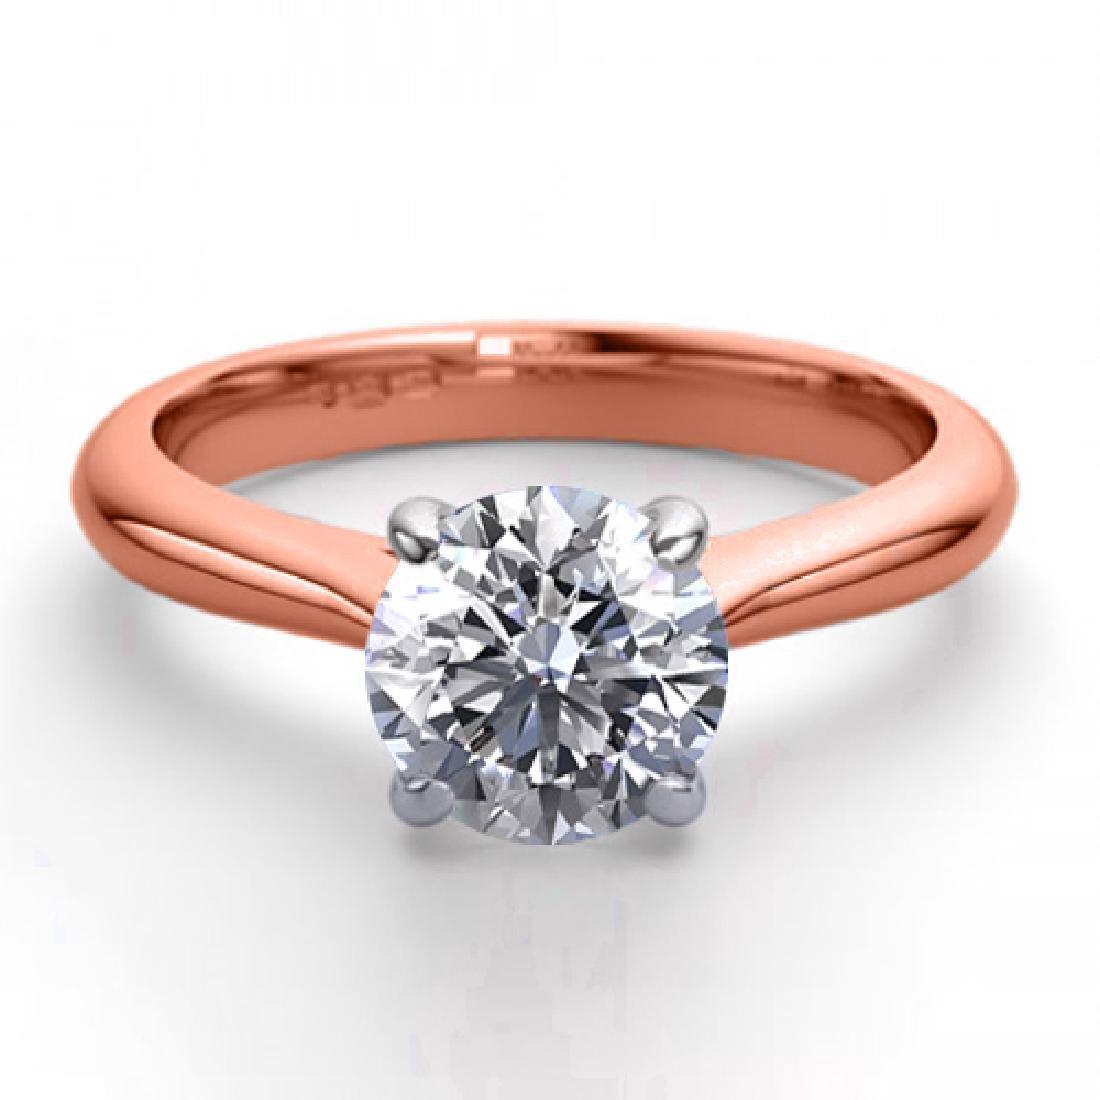 14K Rose Gold Jewelry 1.41 ctw Natural Diamond